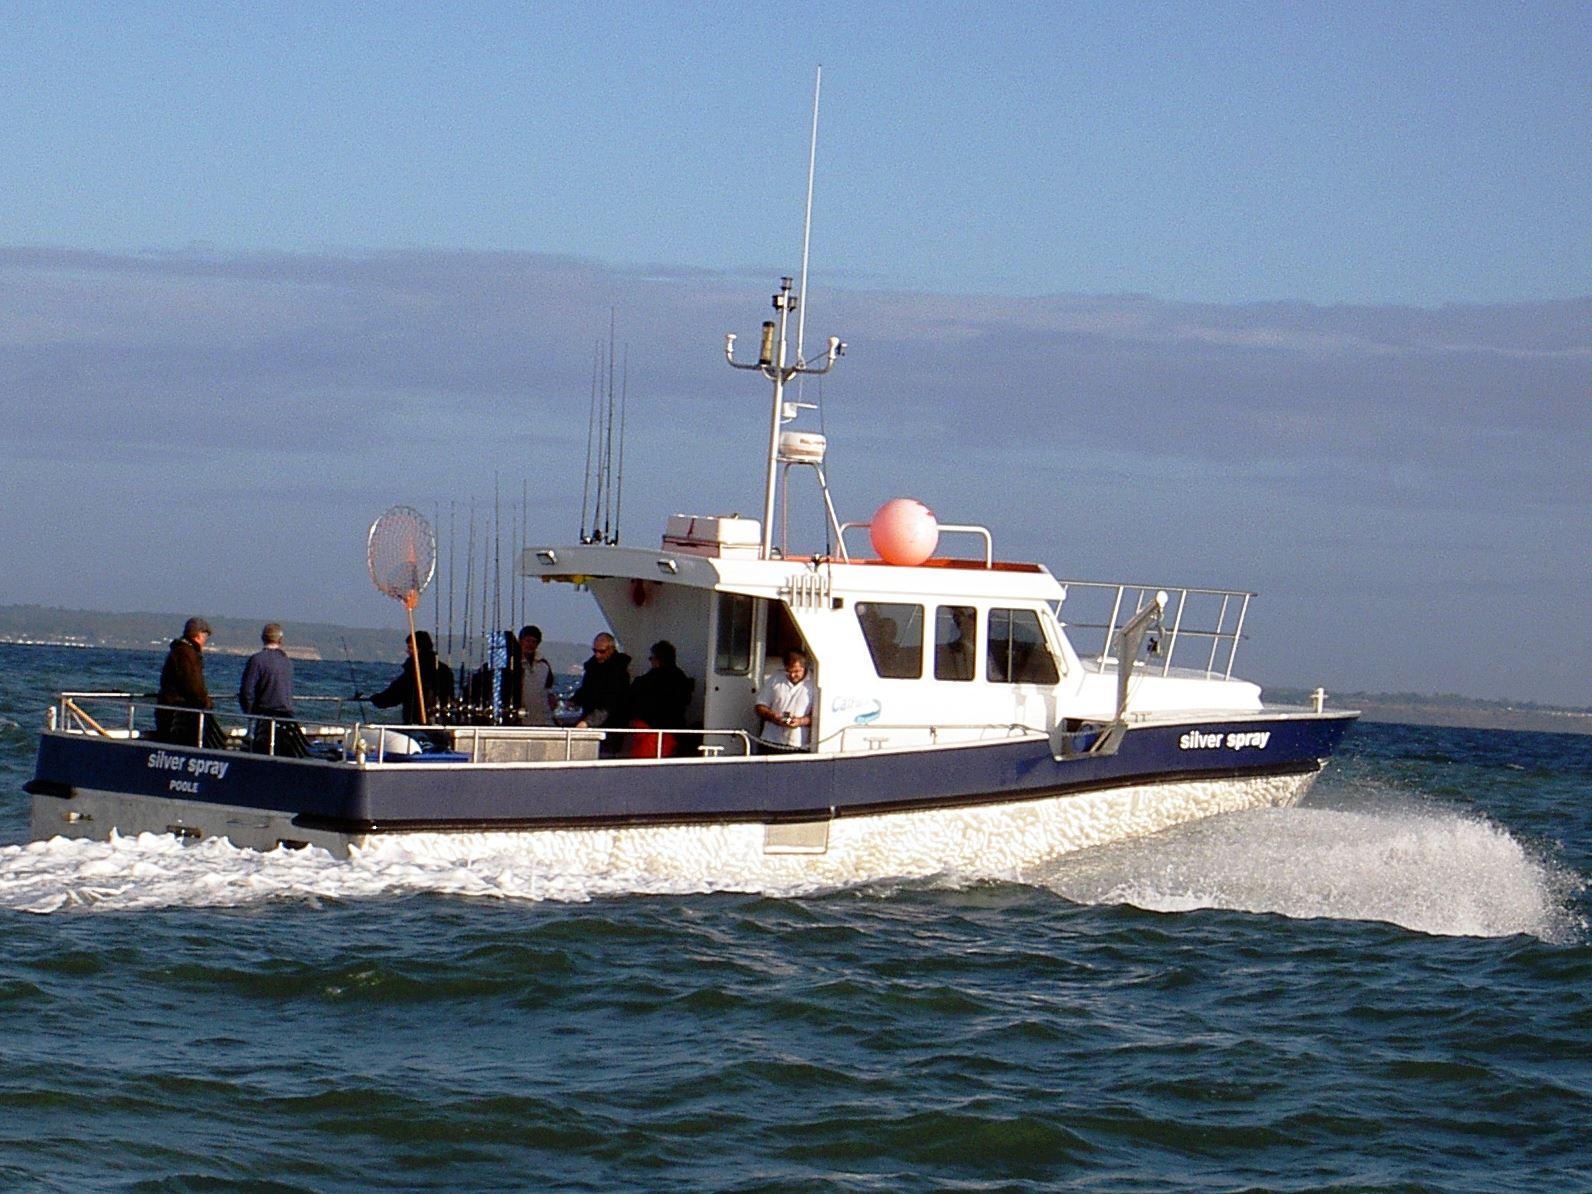 Silver Spray 1 boat